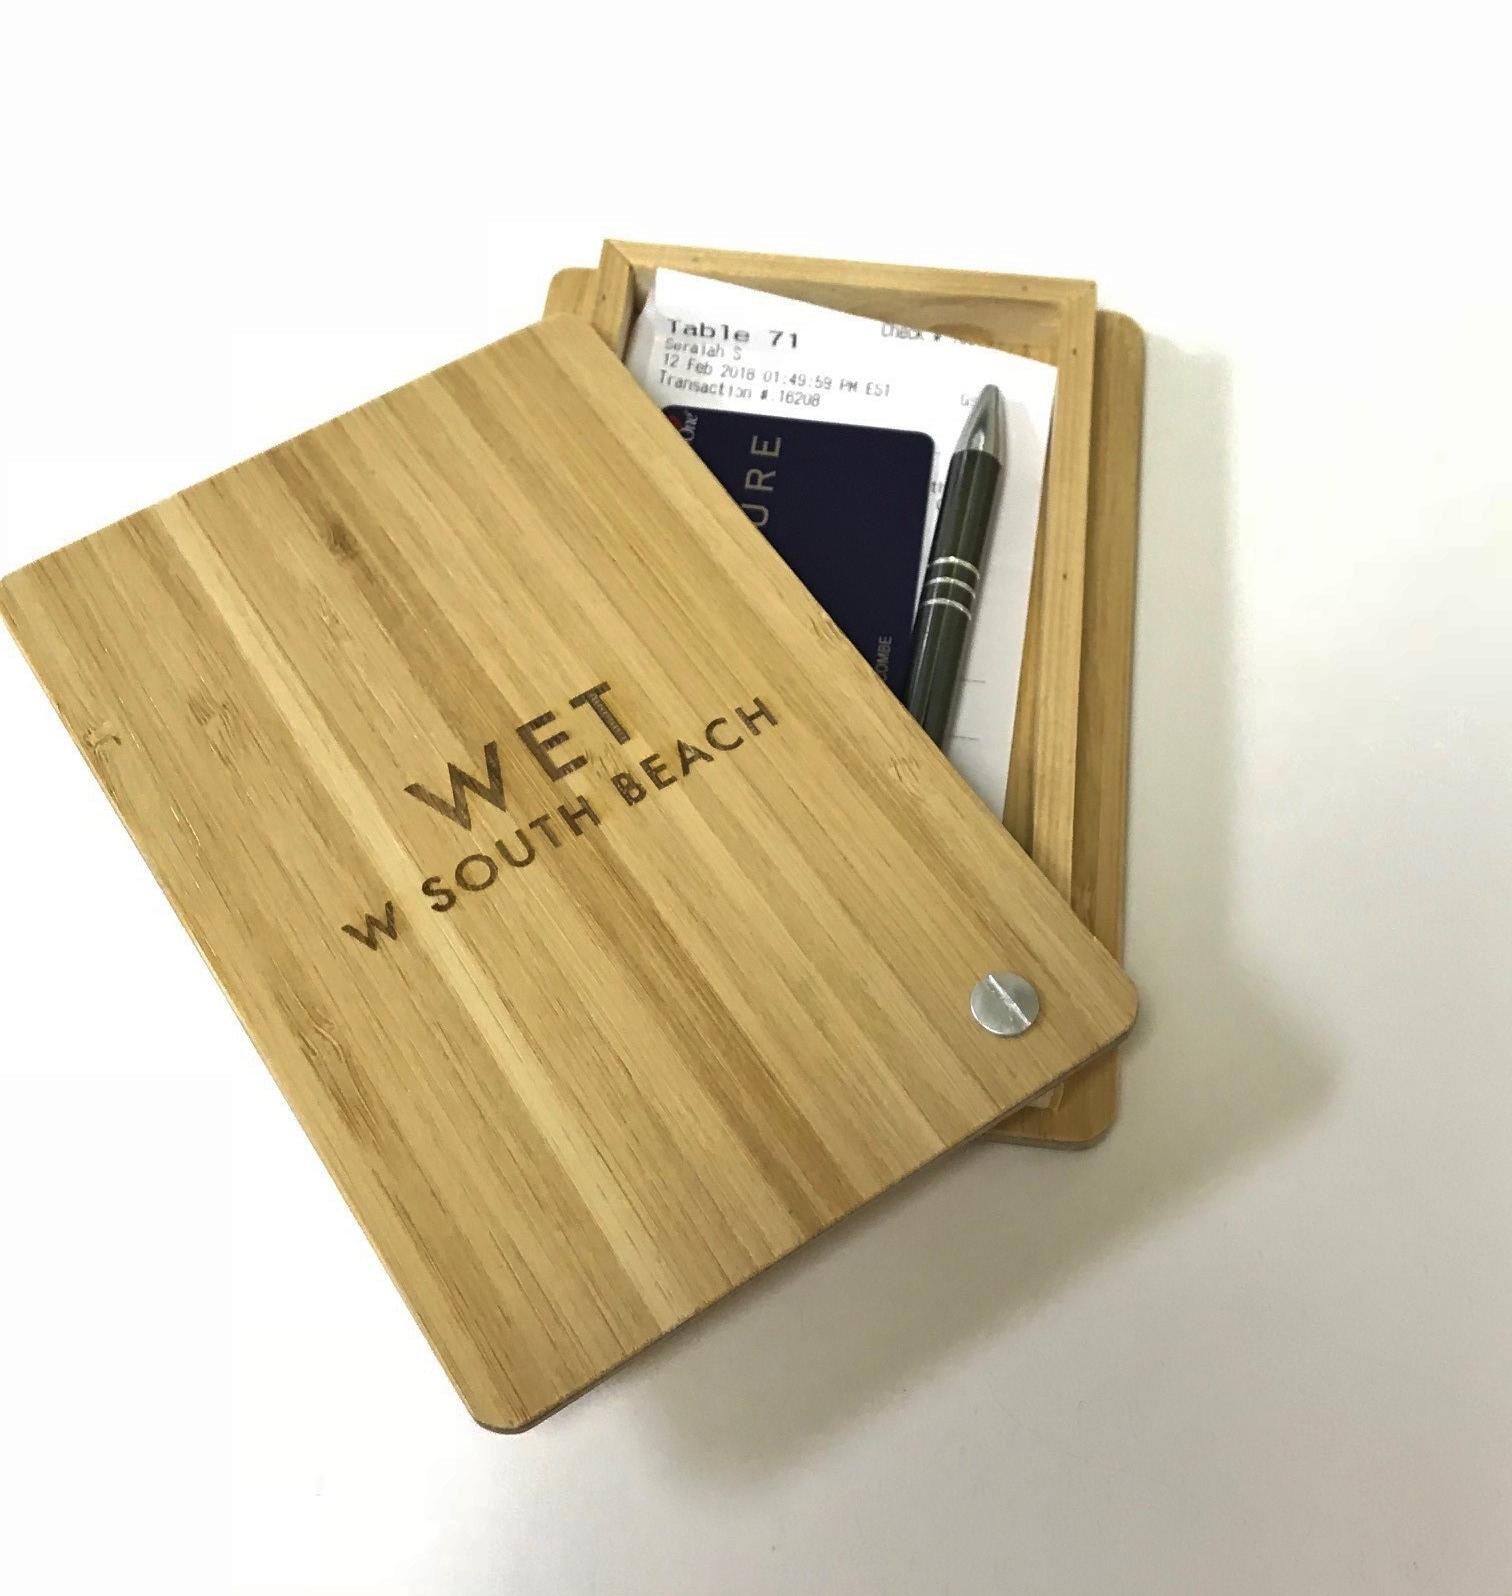 Bamboo Wood Box Check Presenter